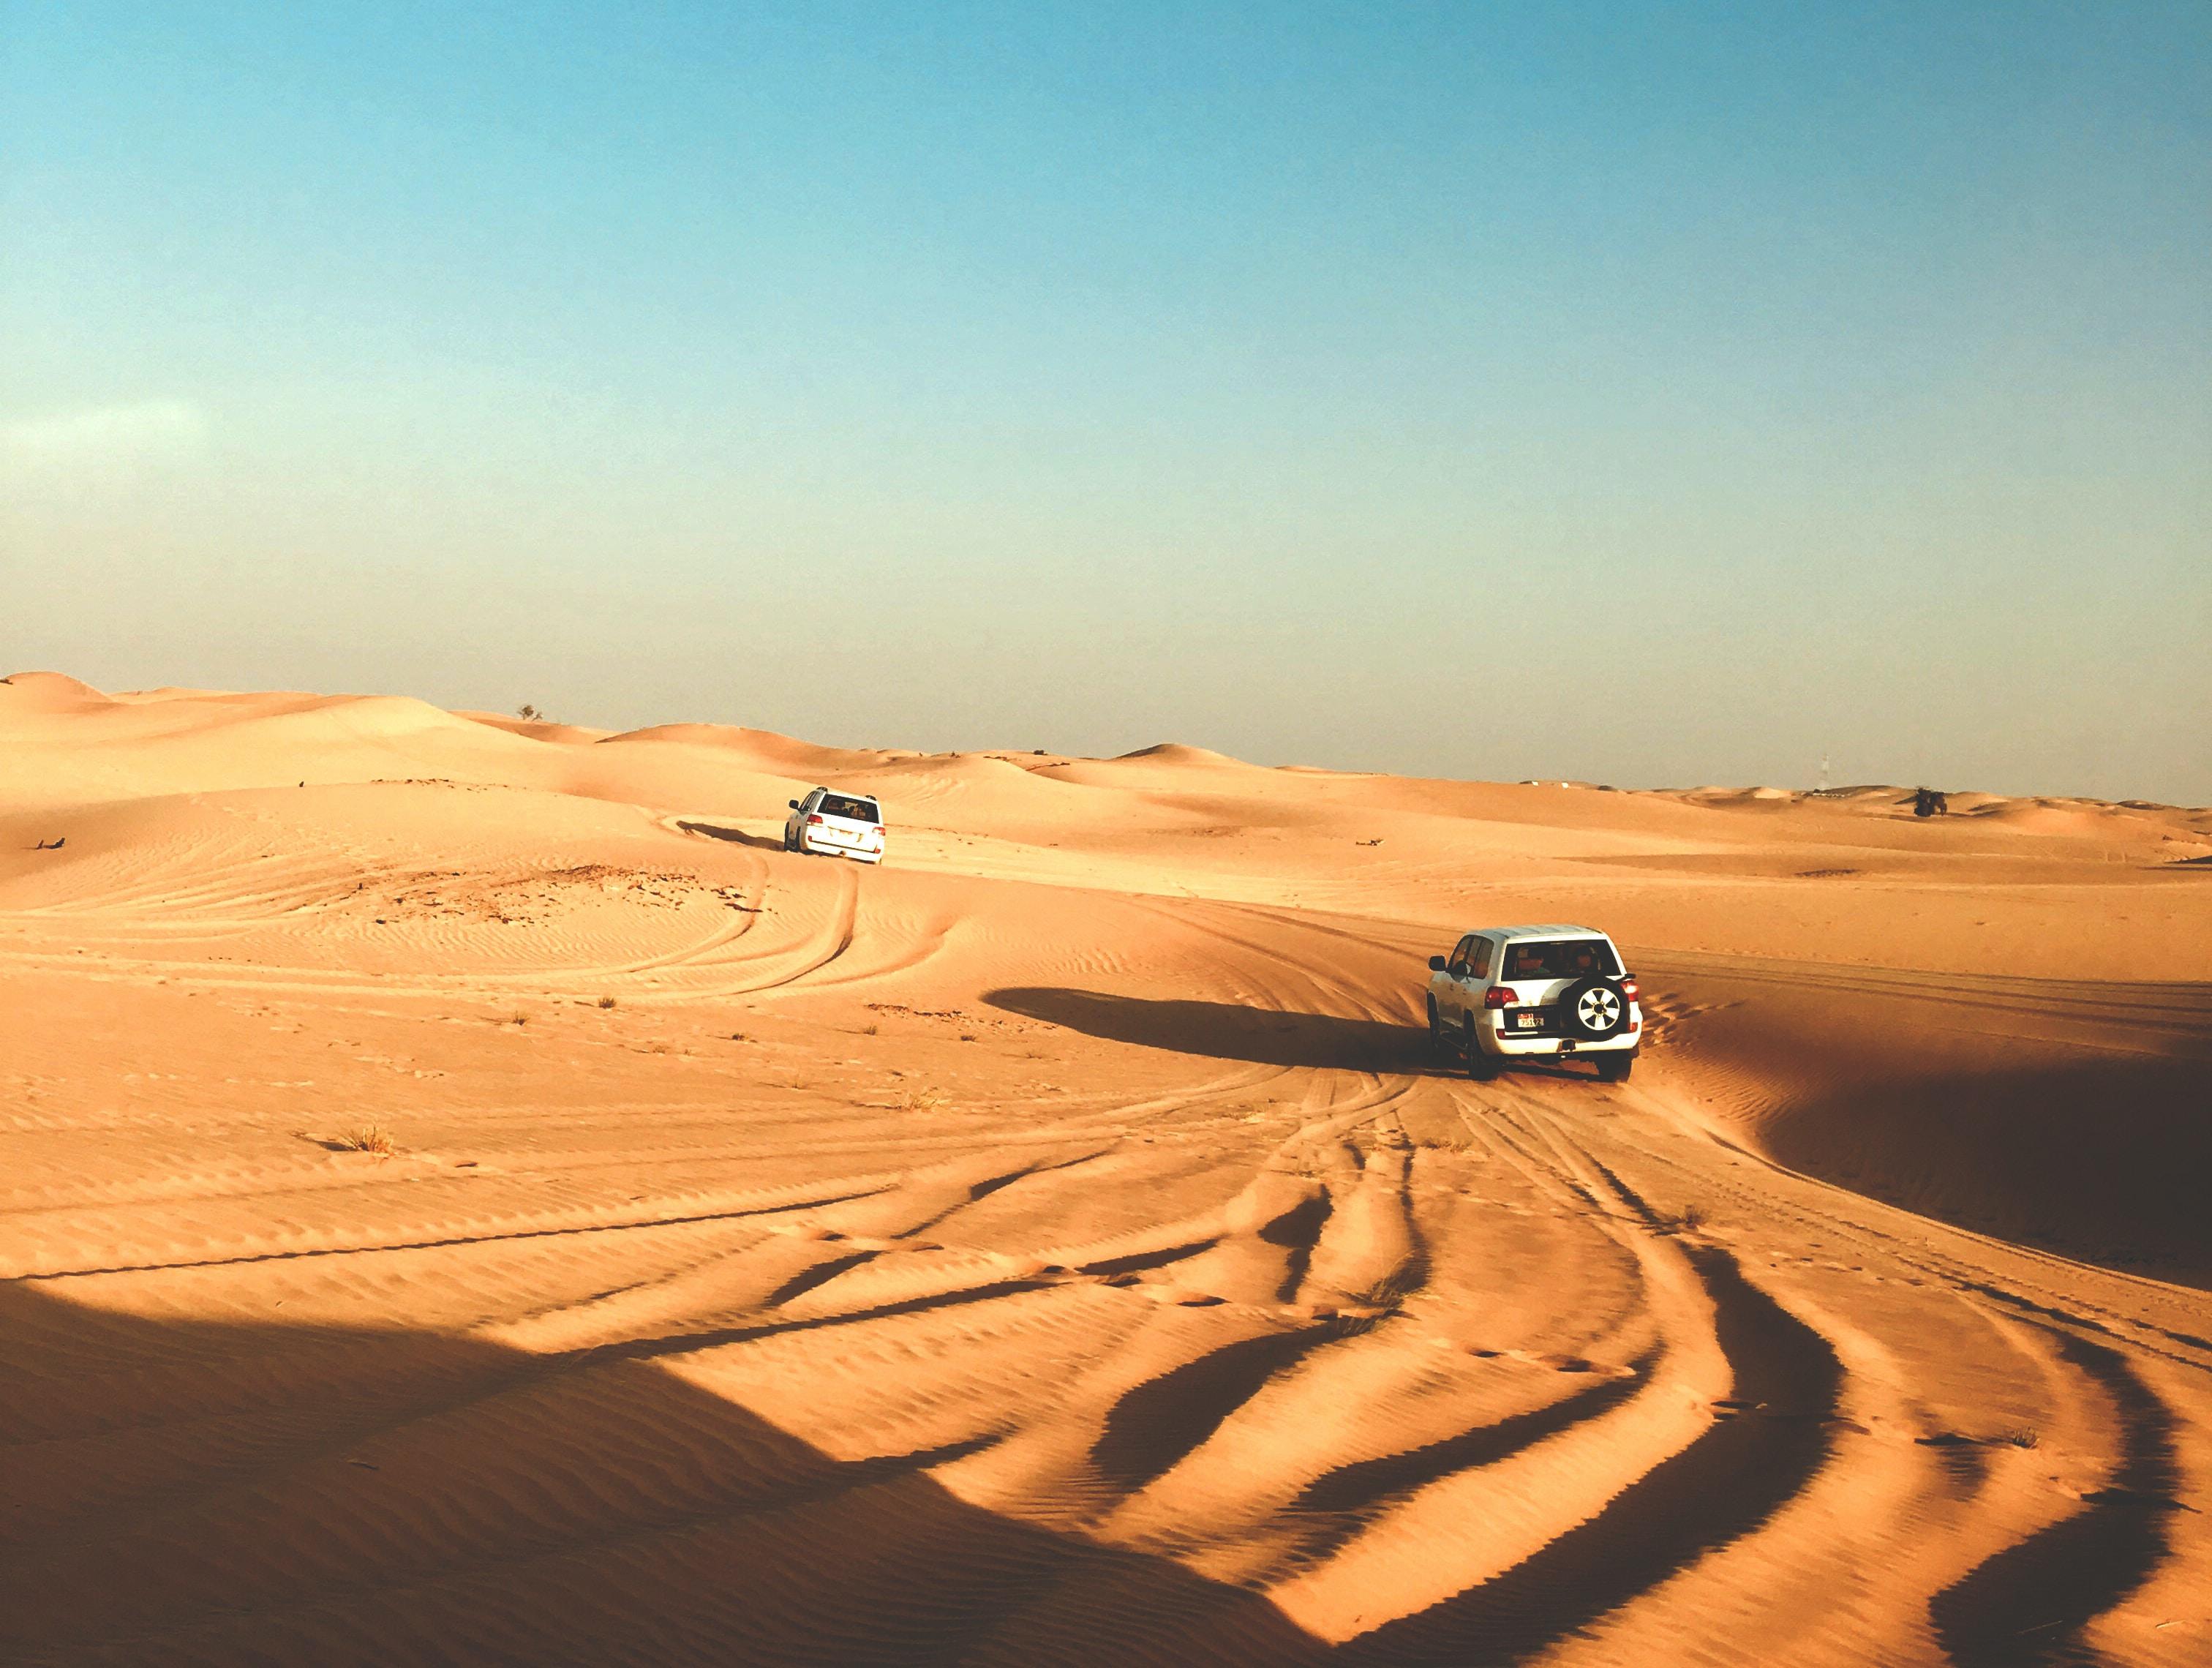 photo of gray vehicle on desert